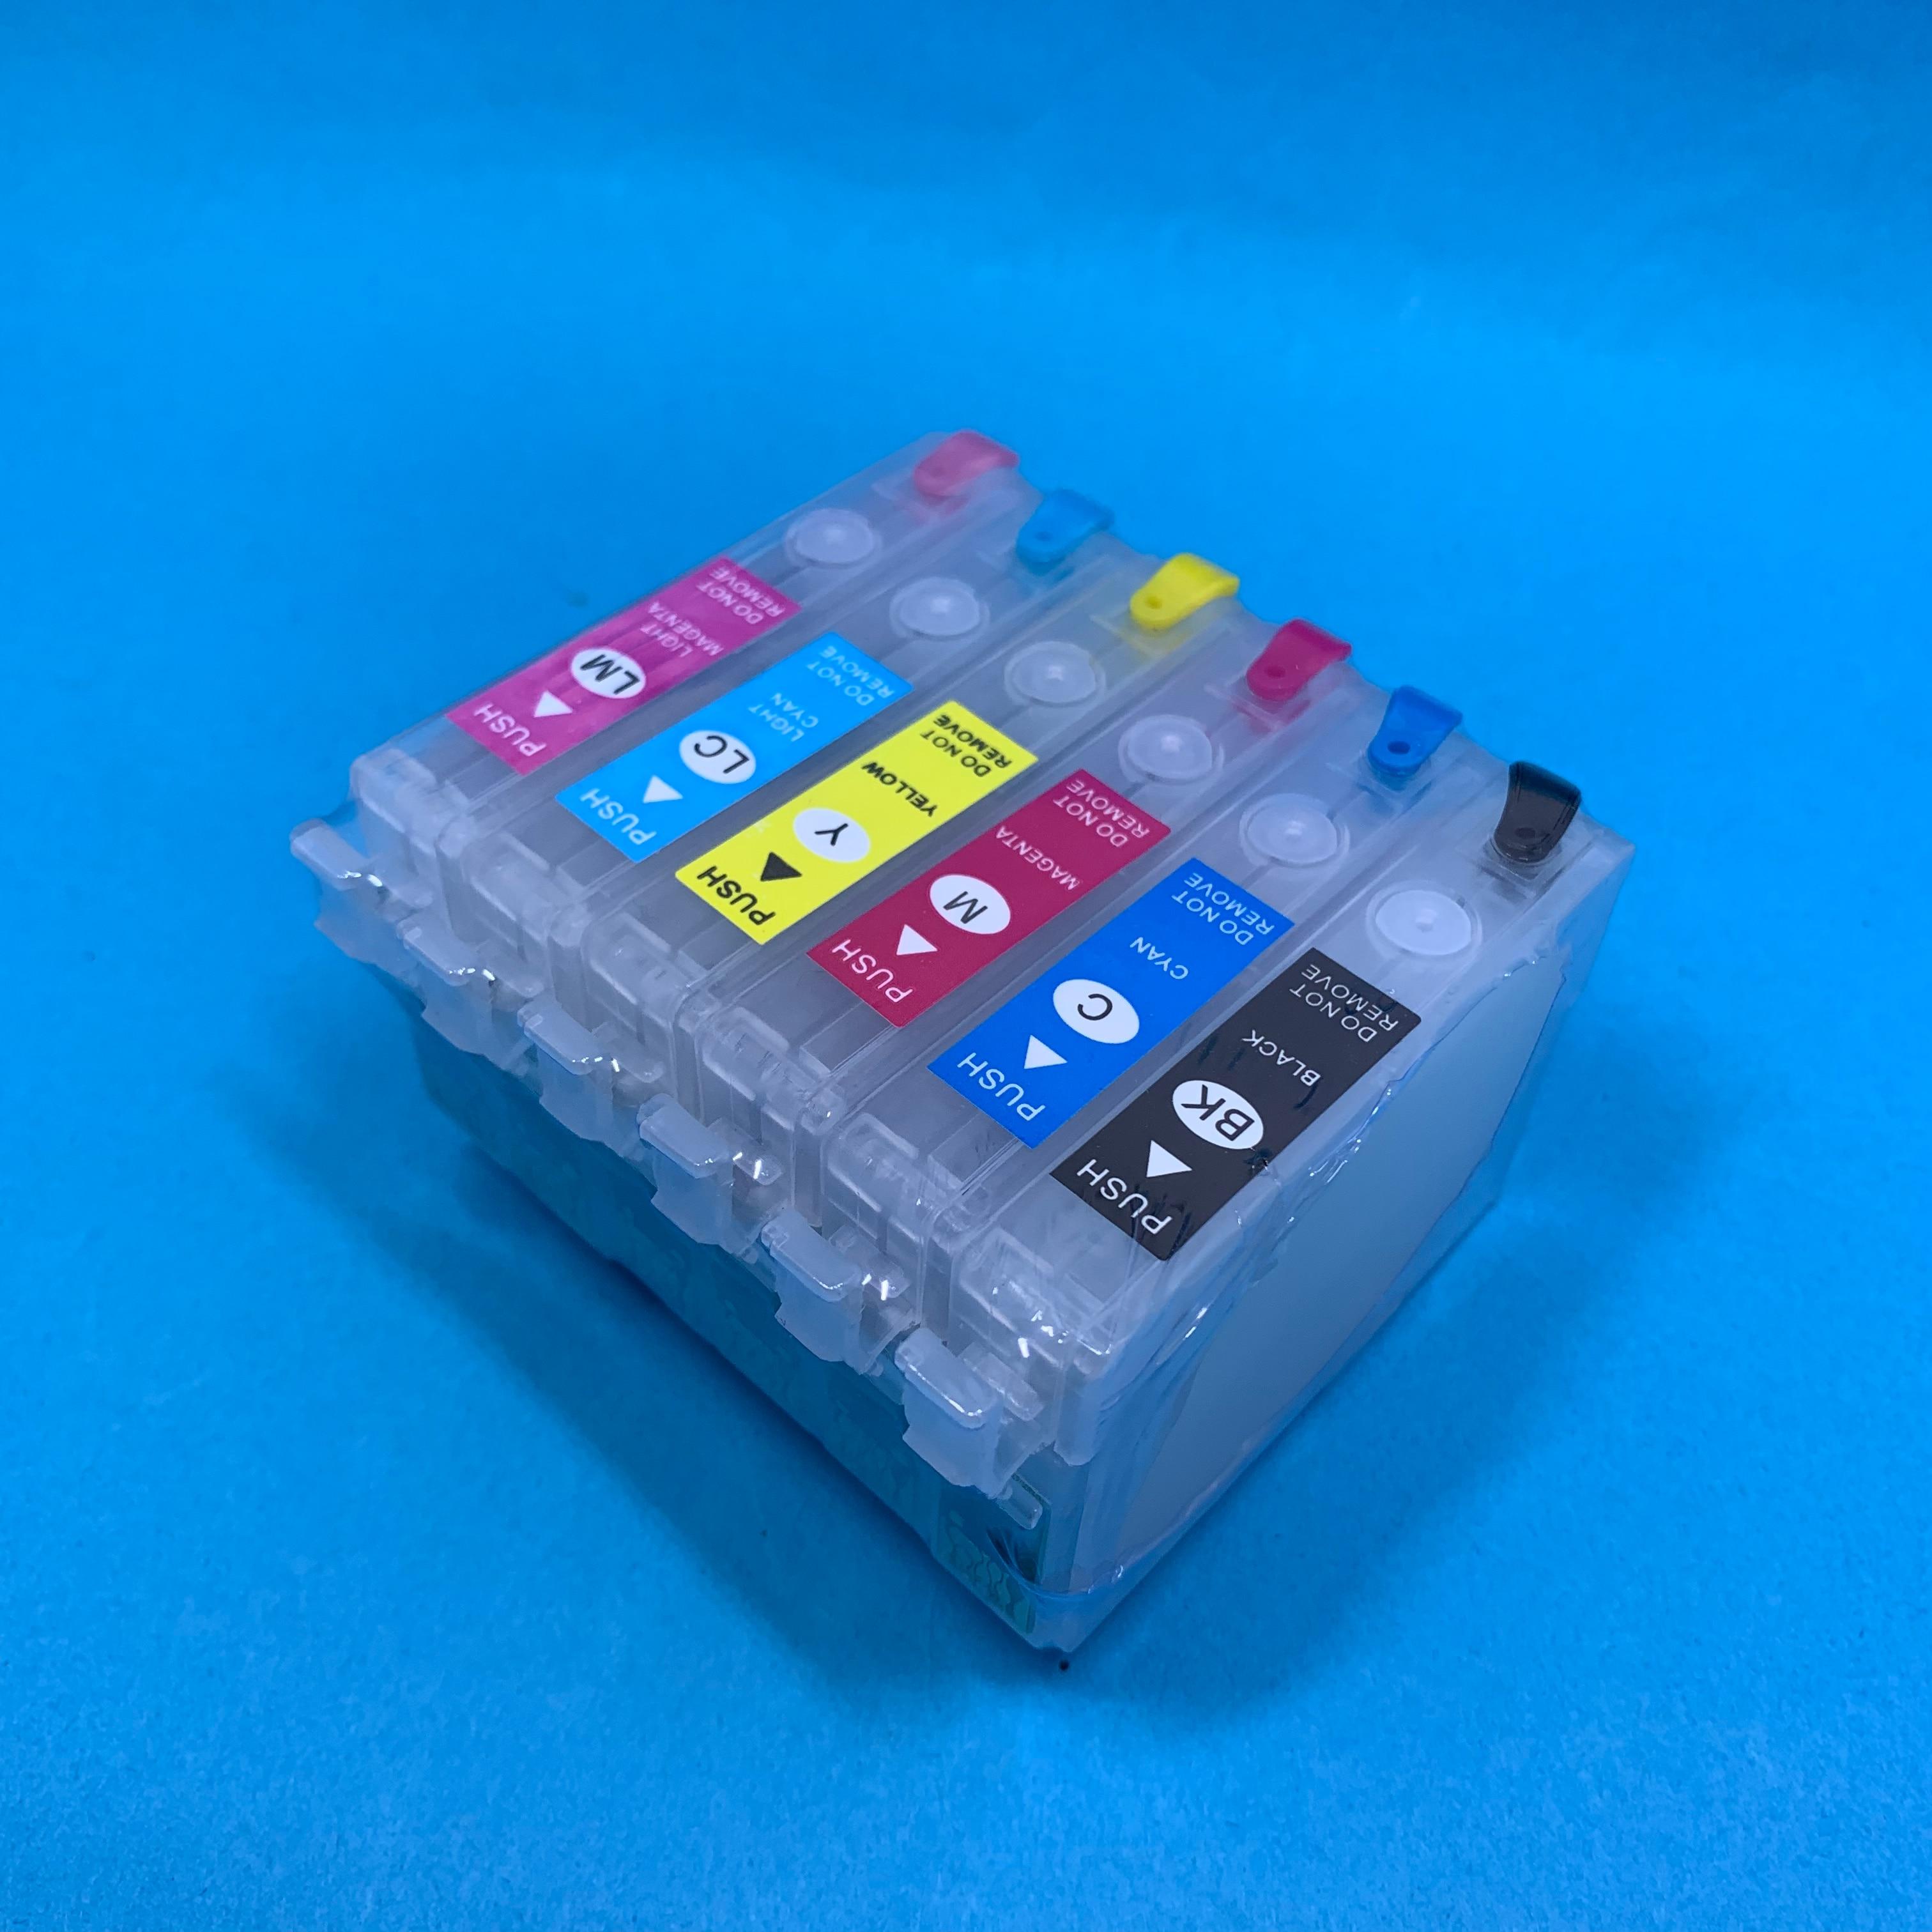 YOTAT Empty T0821N Refillable ink cartridge T0821 - T0826 for Epson Stylus Photo T50/R290/R390/RX590/RX610/RX690/TX650/TX700W